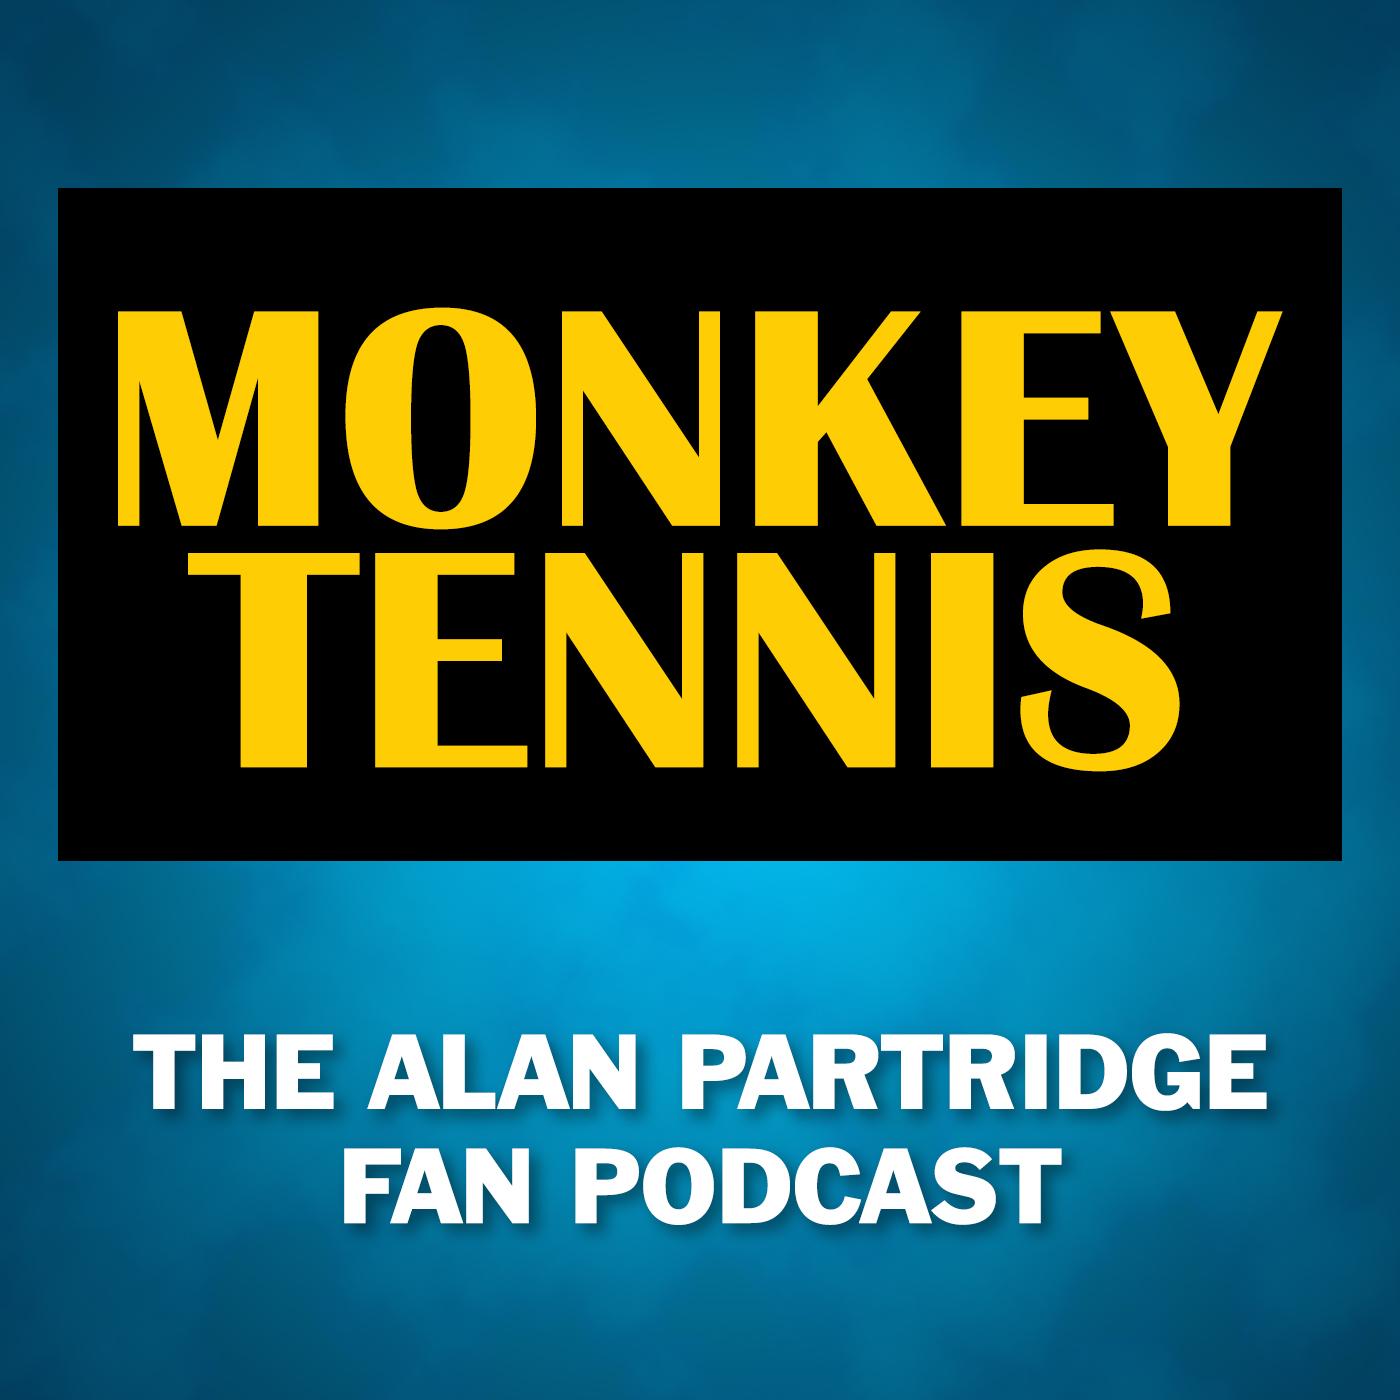 monkeytennis-final.jpg